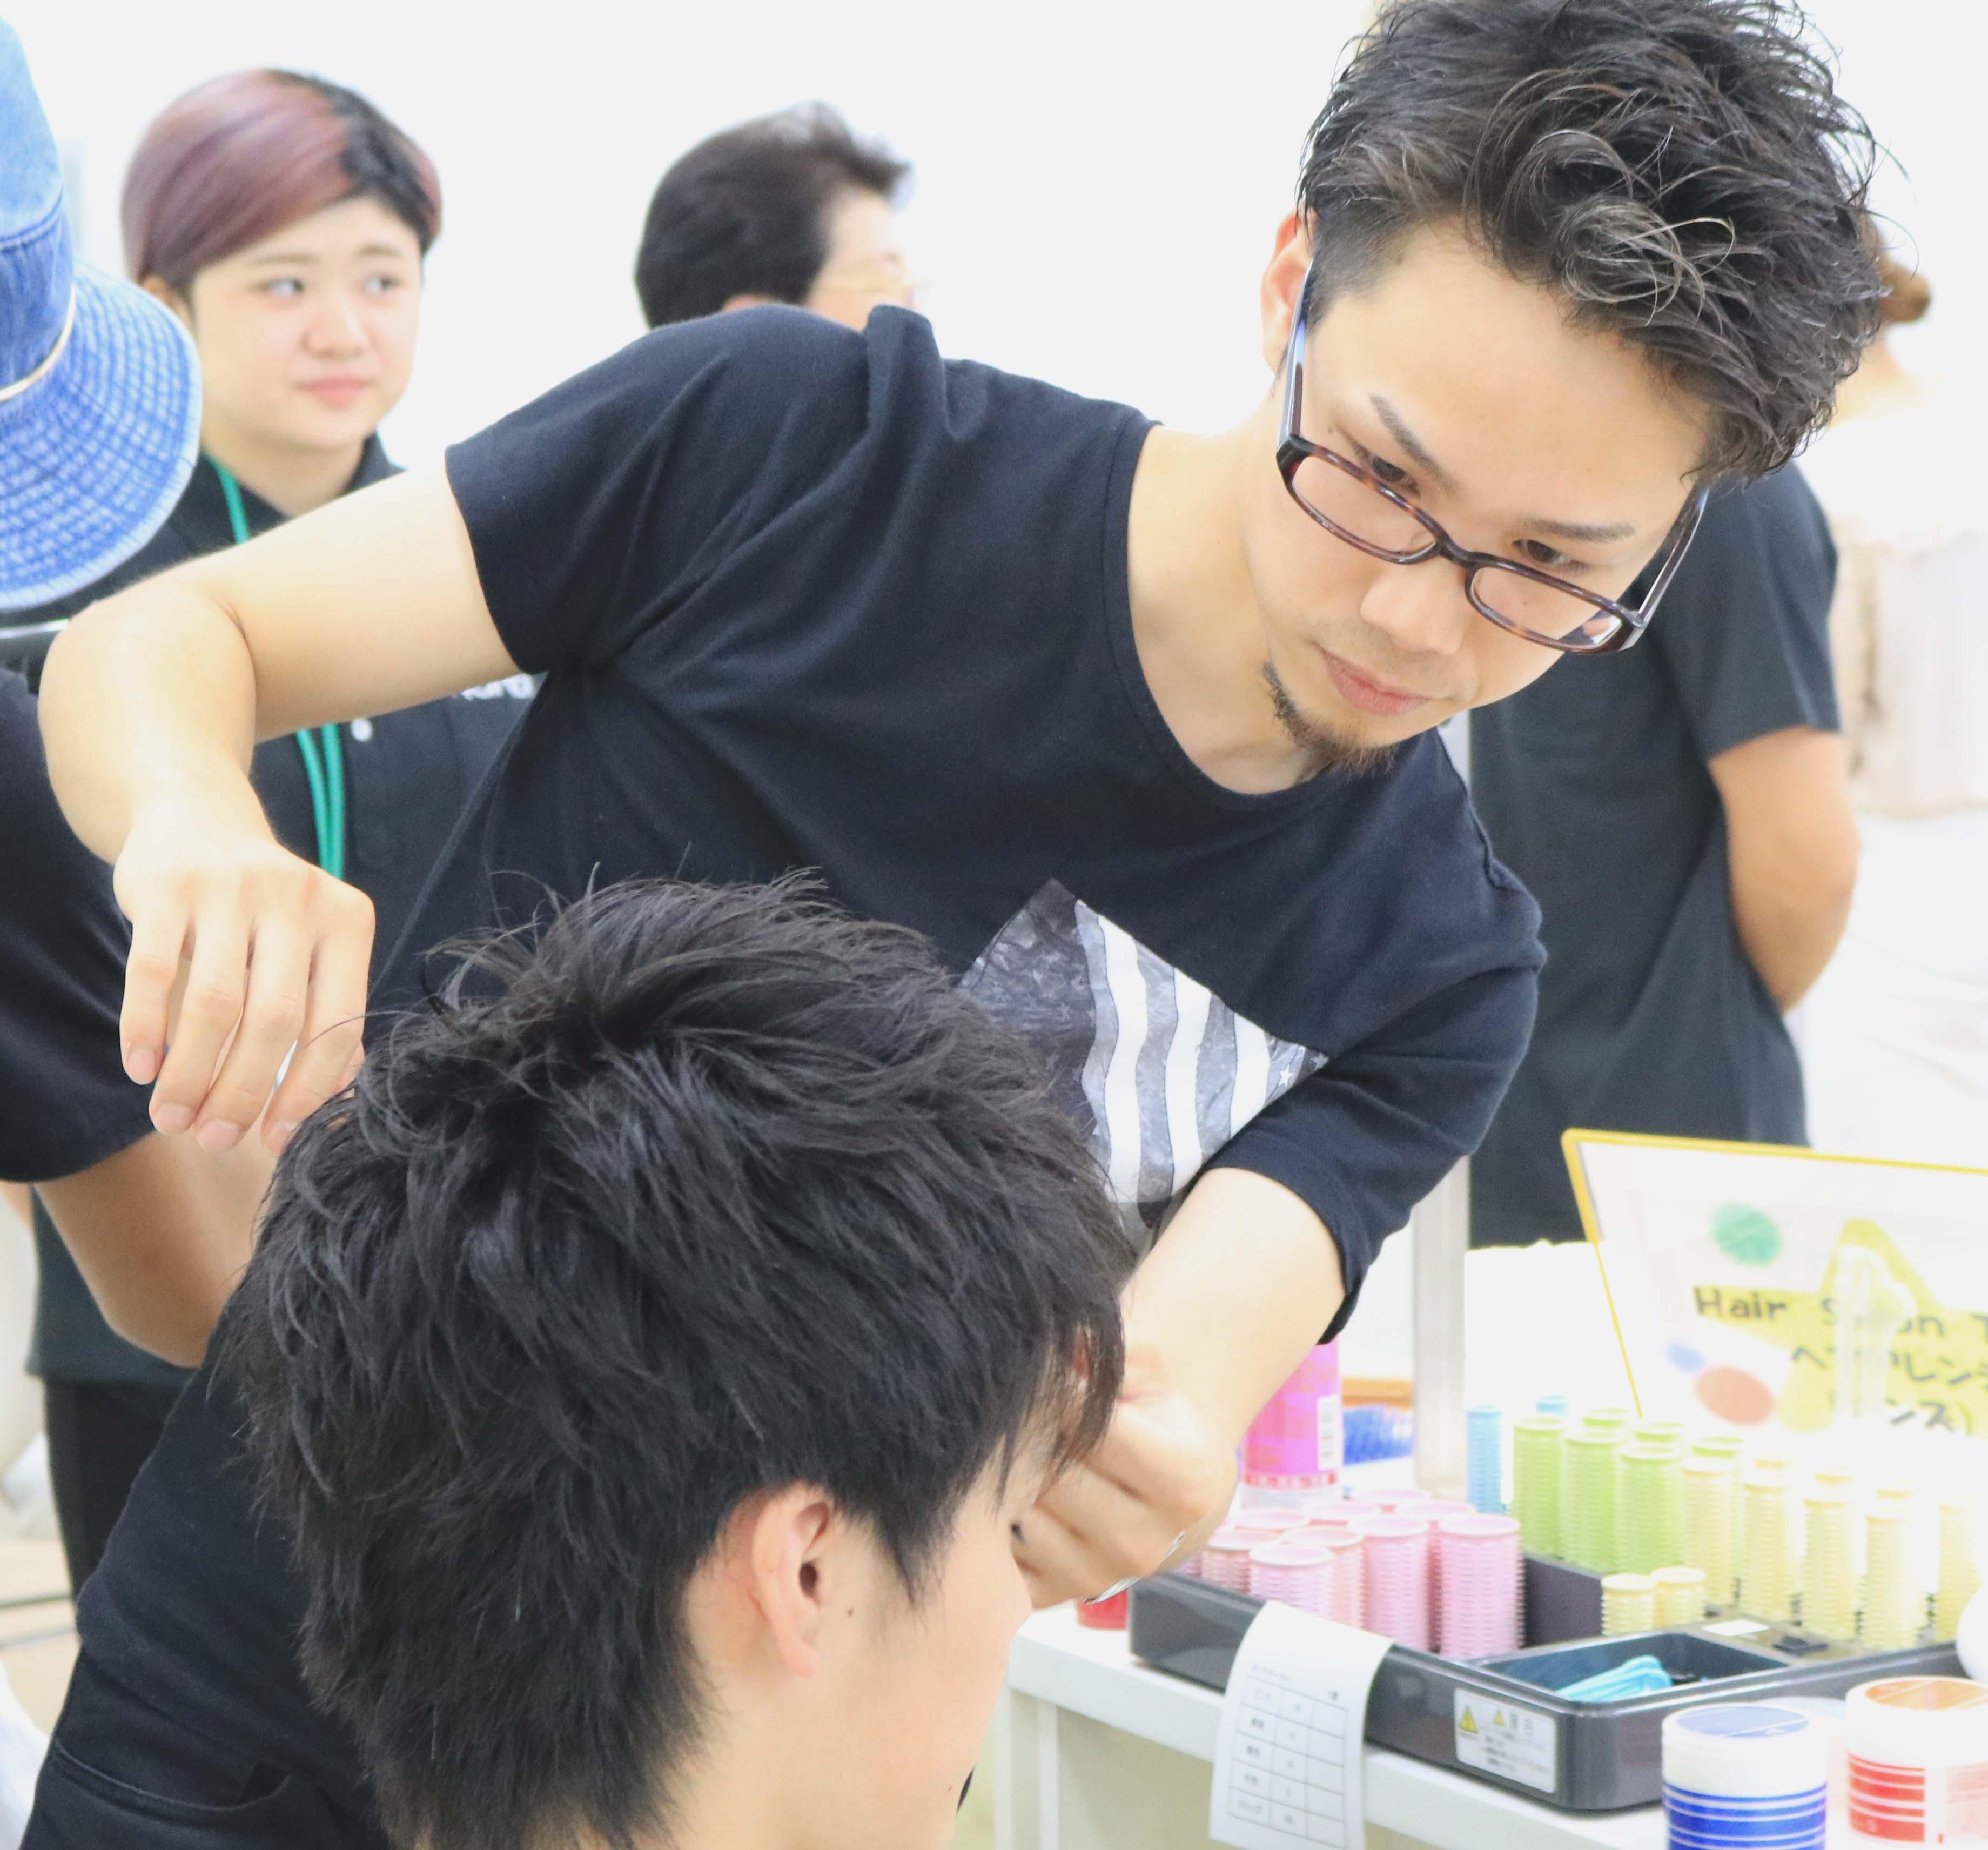 【開催終了】8/6(月) NaRiBiサロン